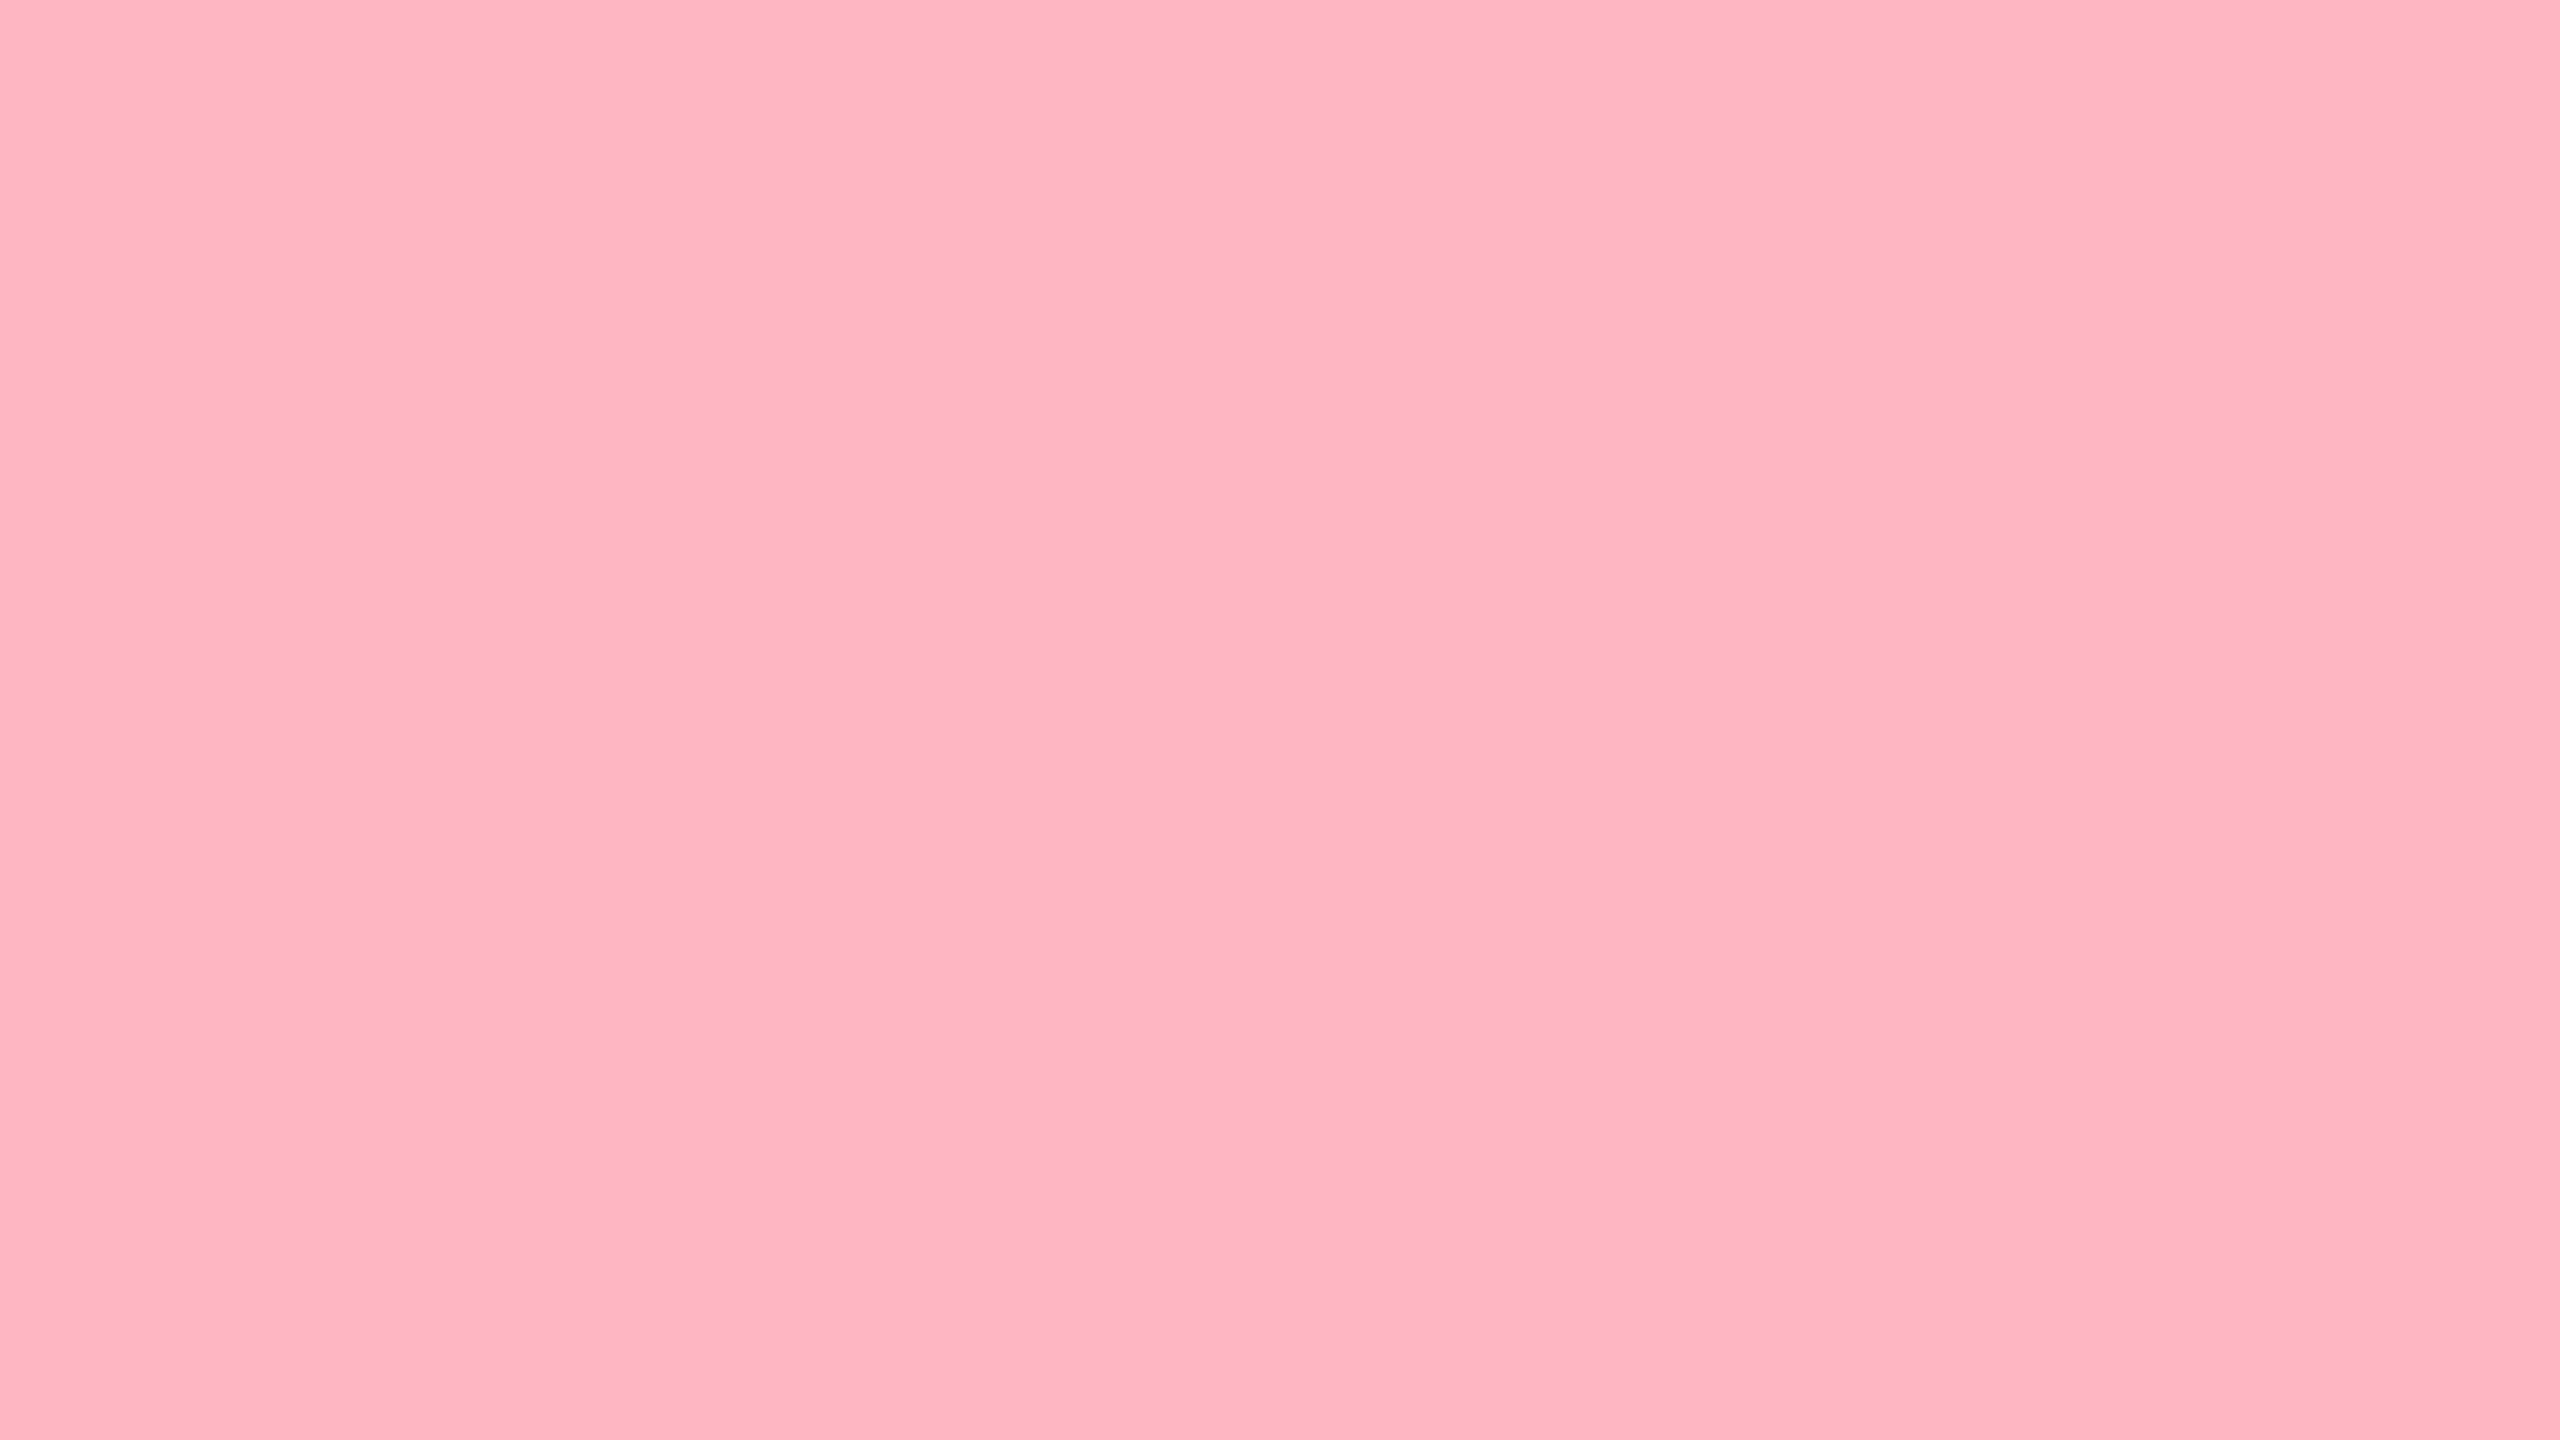 2560x1440 Light Pink Solid Color Background